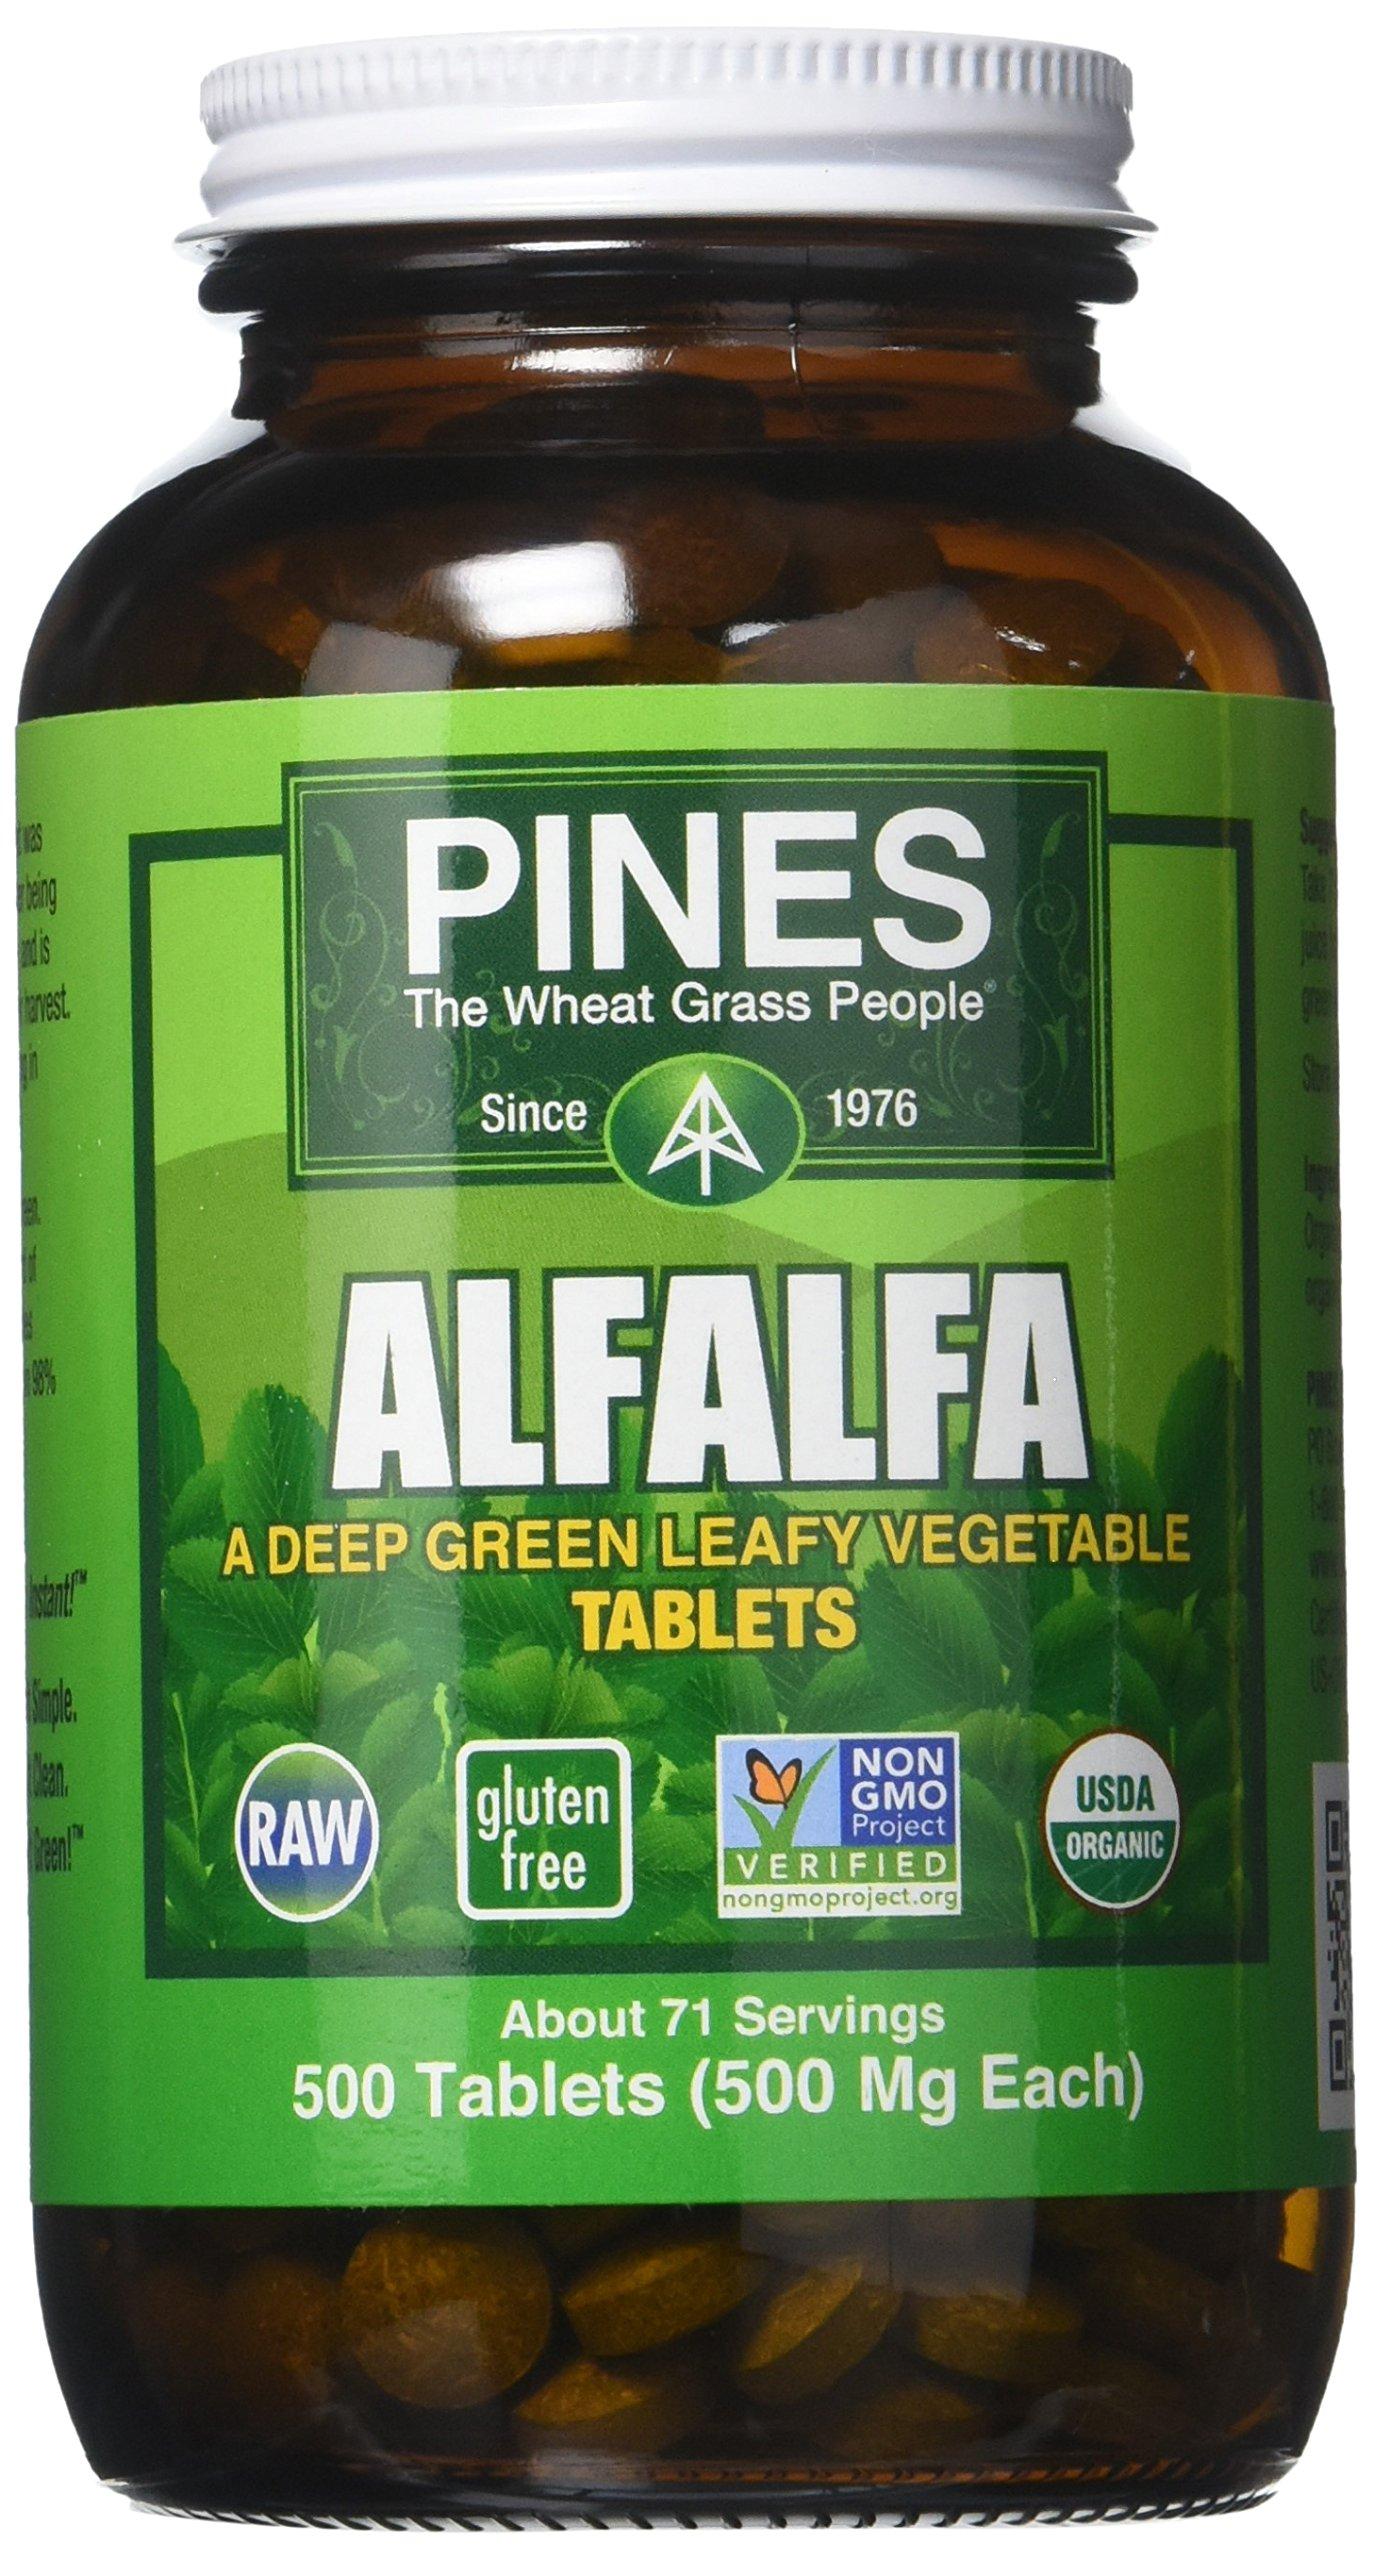 Pines Organic Alfalfa Tablets - 500 per pack - 1 each.